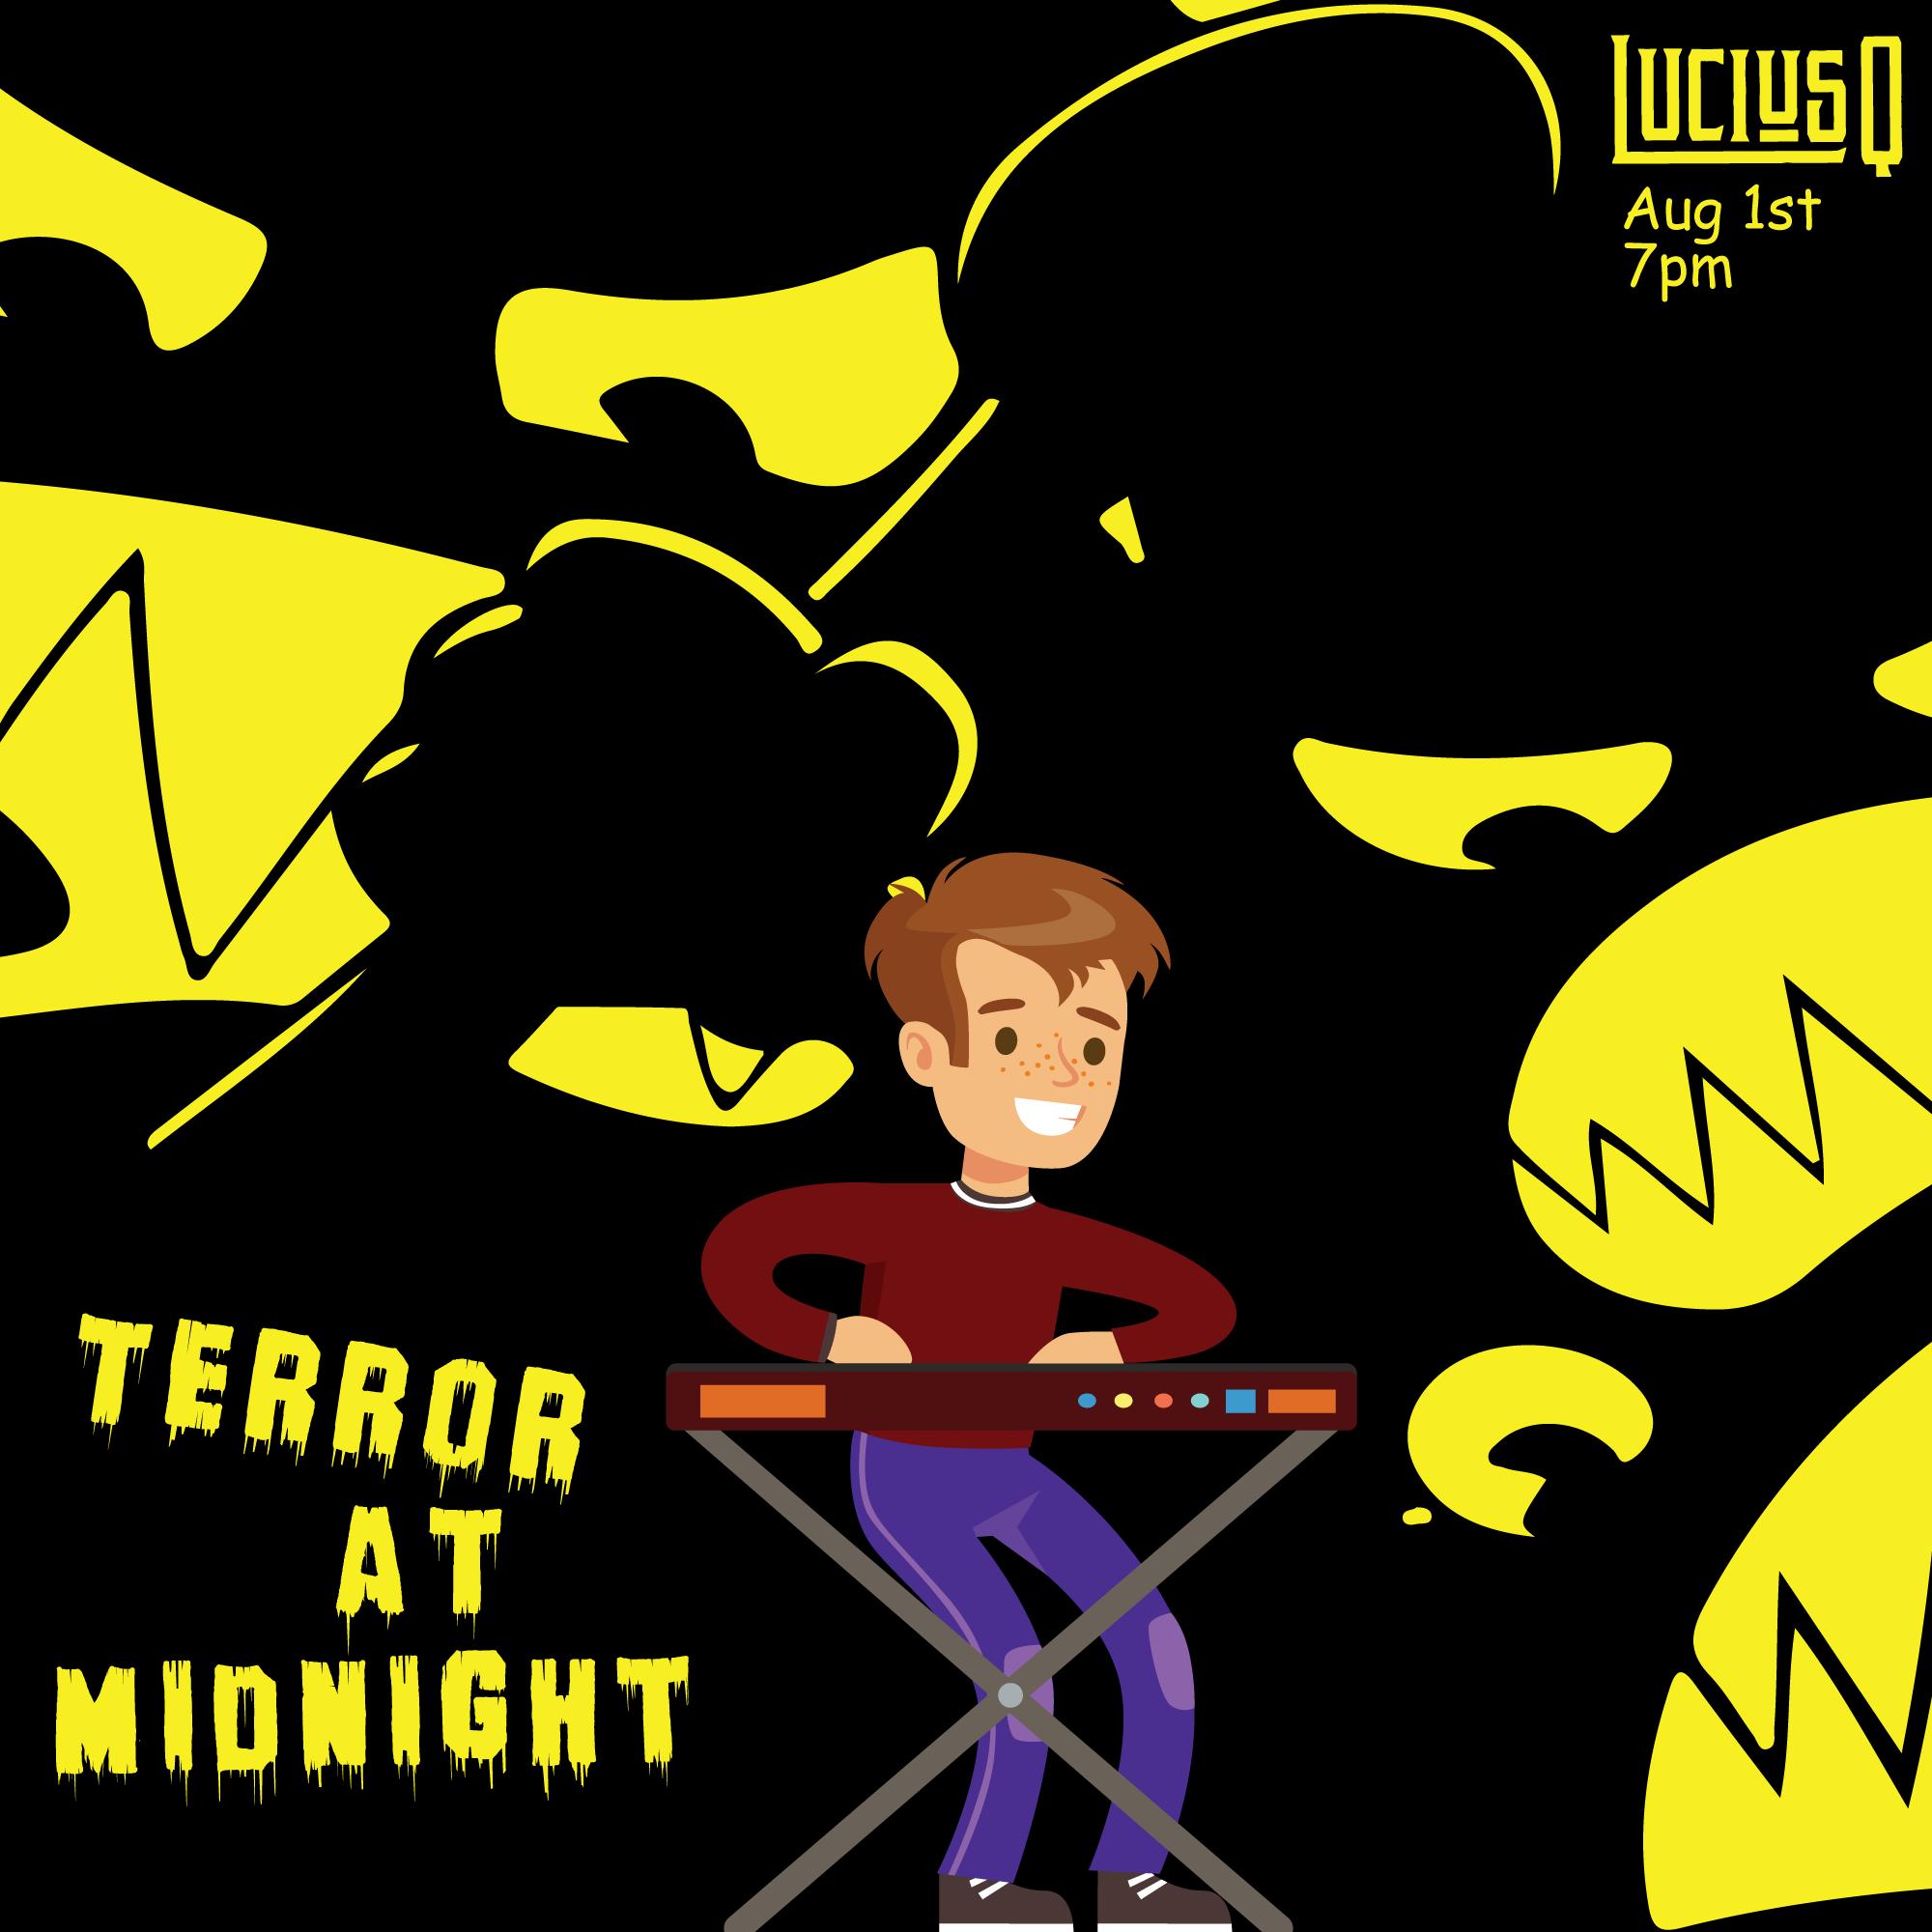 FiR-Creative---LuciusQ---Terror-August.png